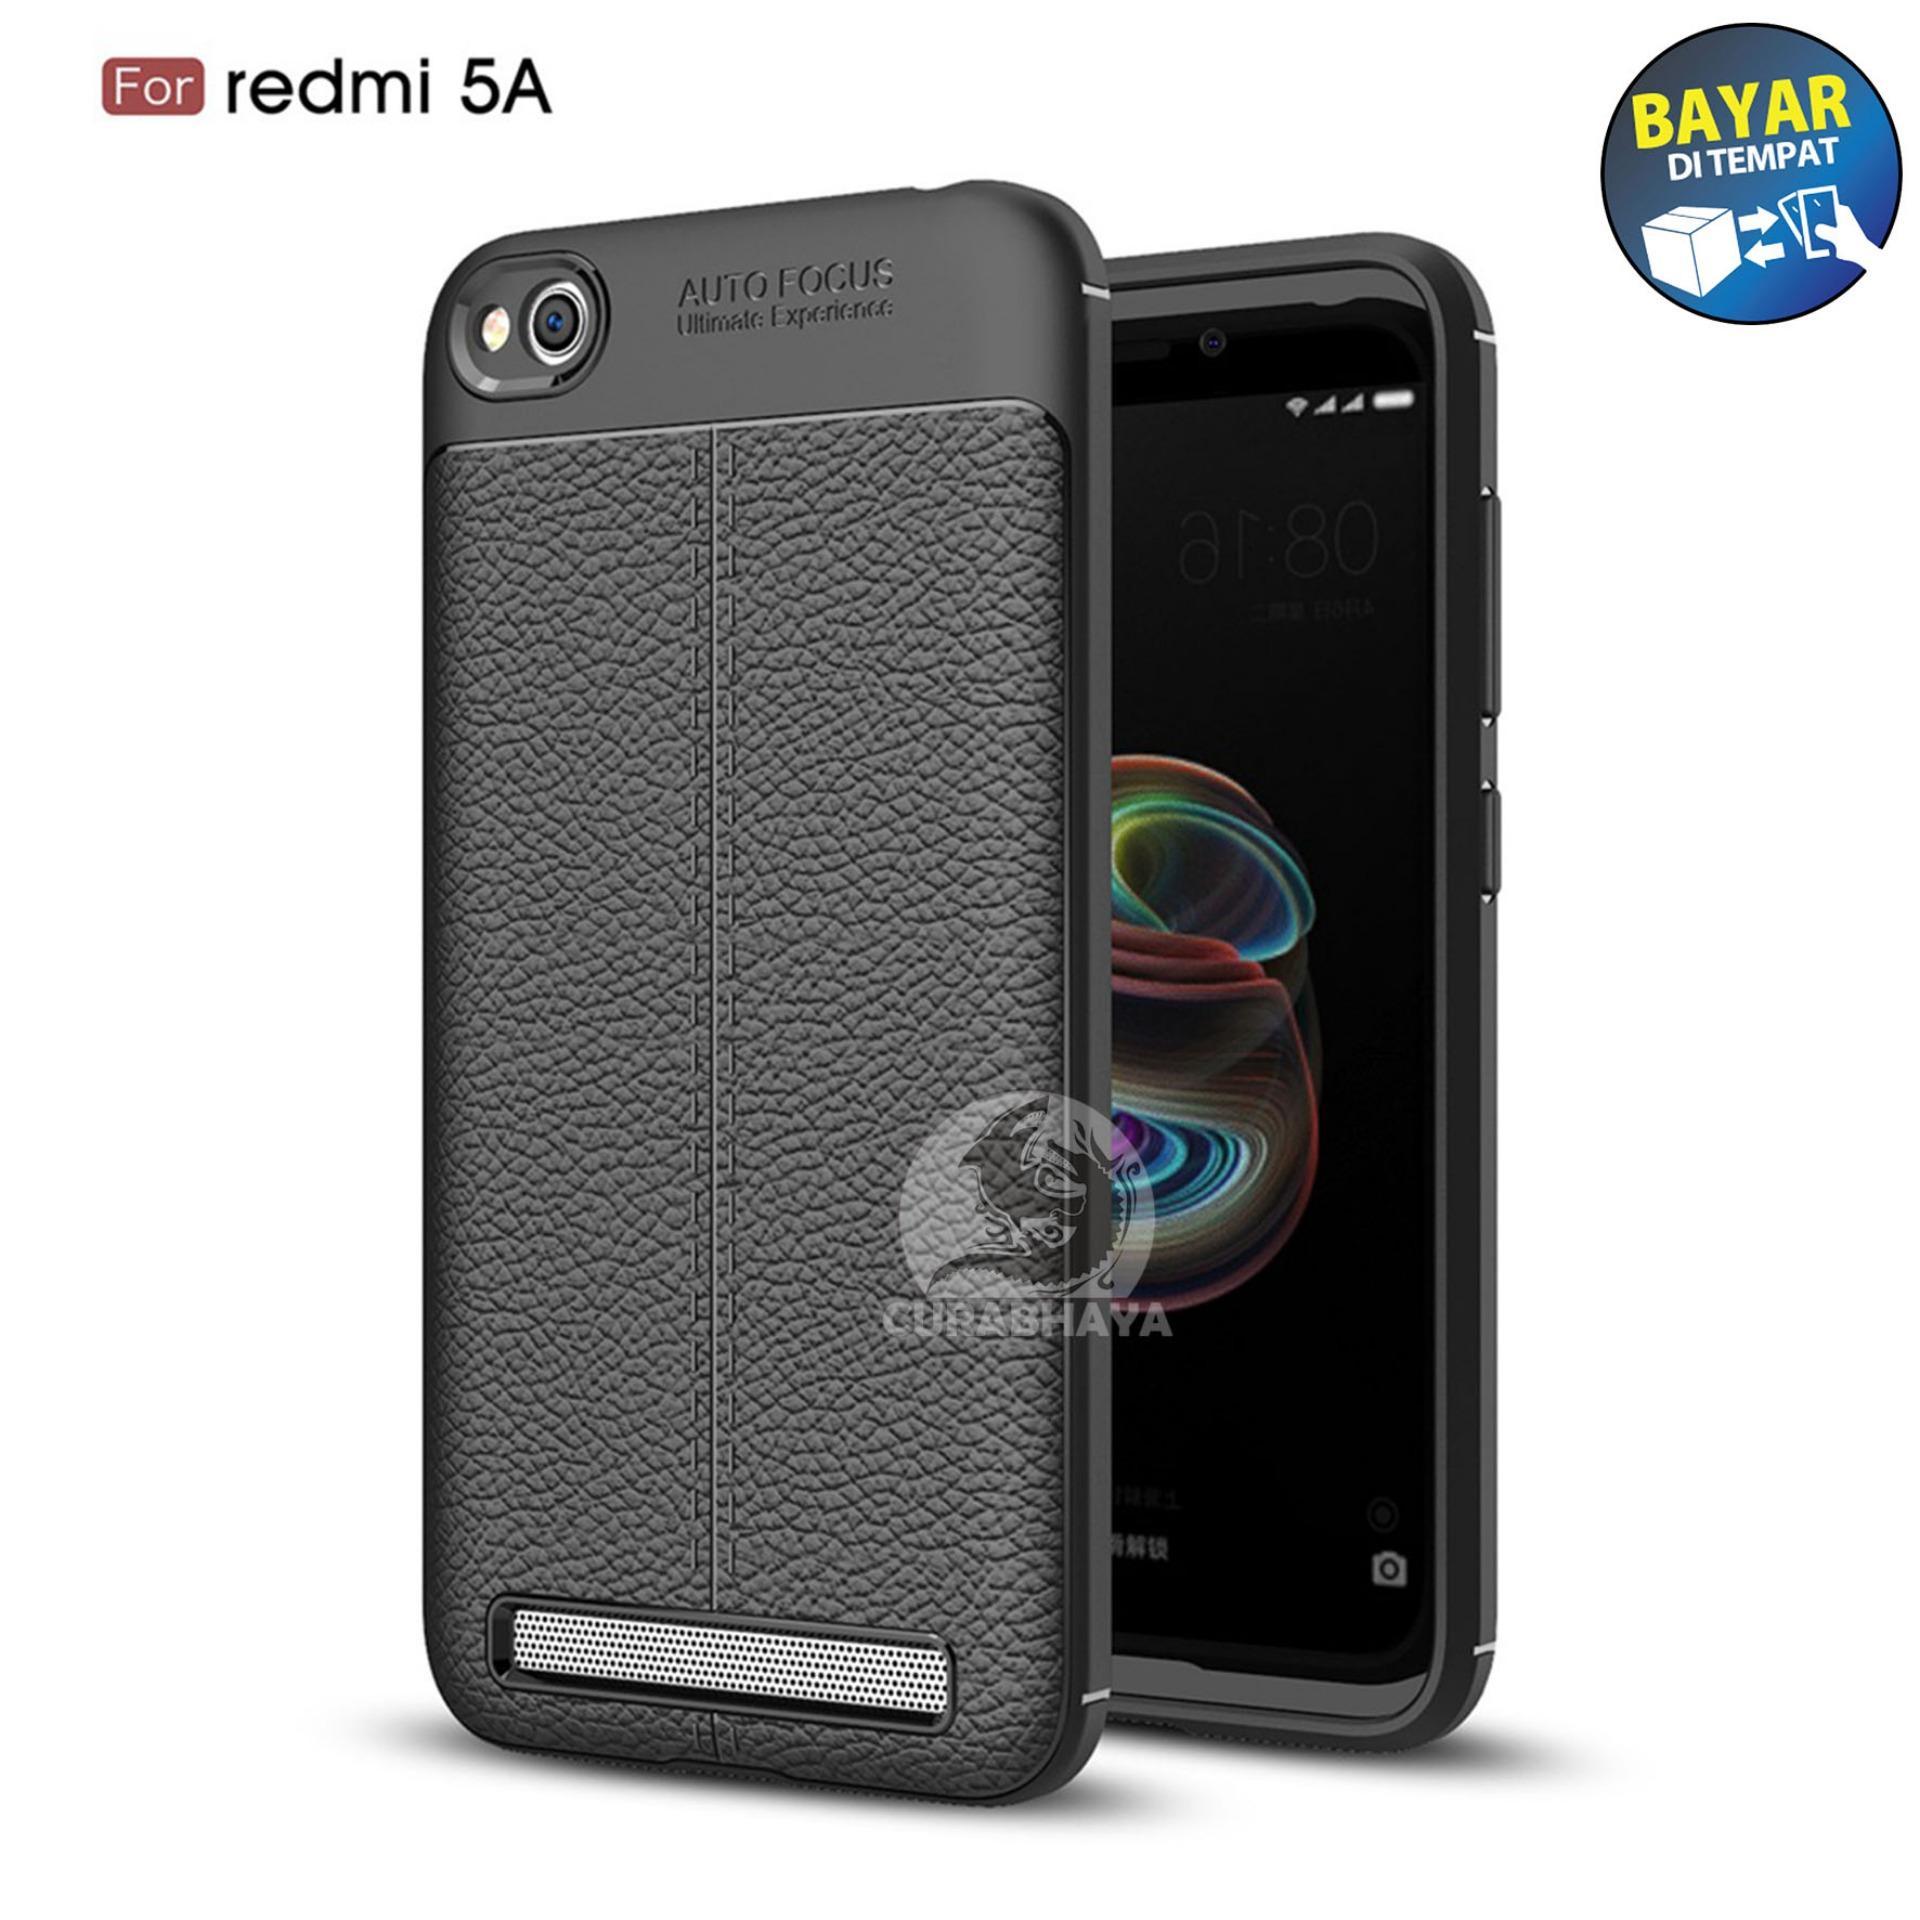 Fashion Plating Mate Pembekuan Kasus 3 In 1 Pc Penutup Belakanguntuk Source · AutoCase Xiaomi Redmi 5A Prime